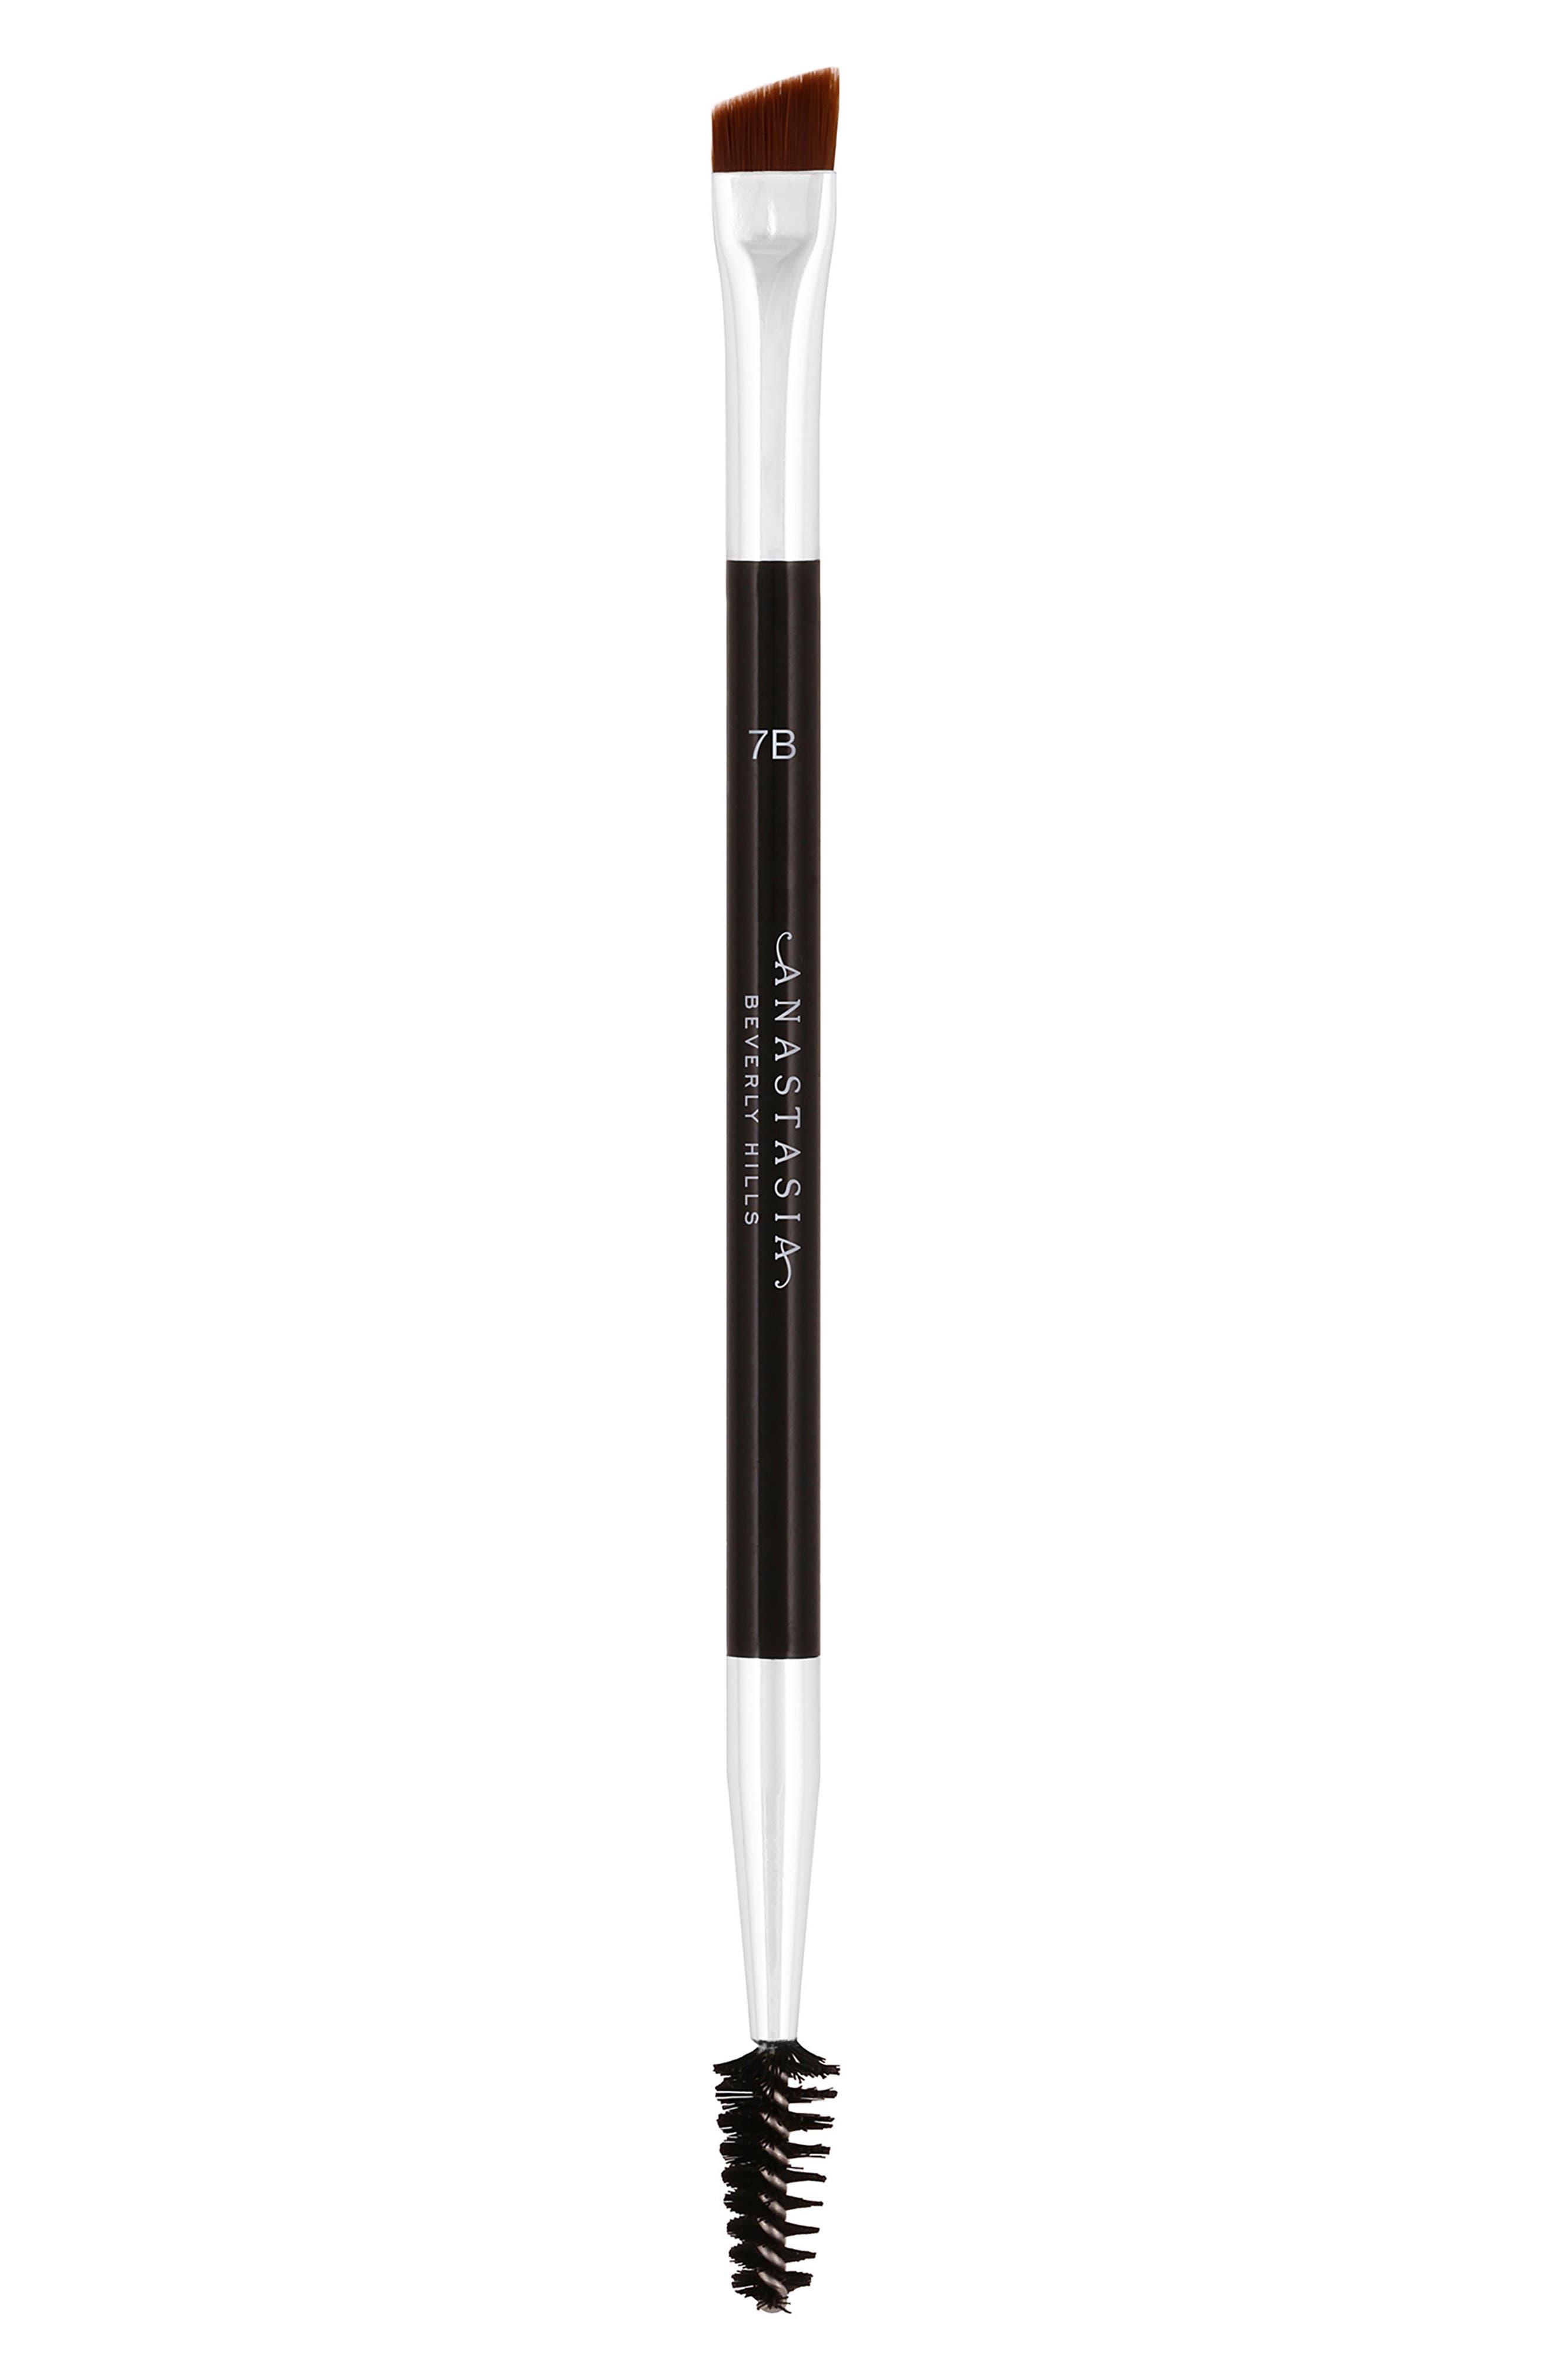 7B Duo Brush,                         Main,                         color, NO COLOR